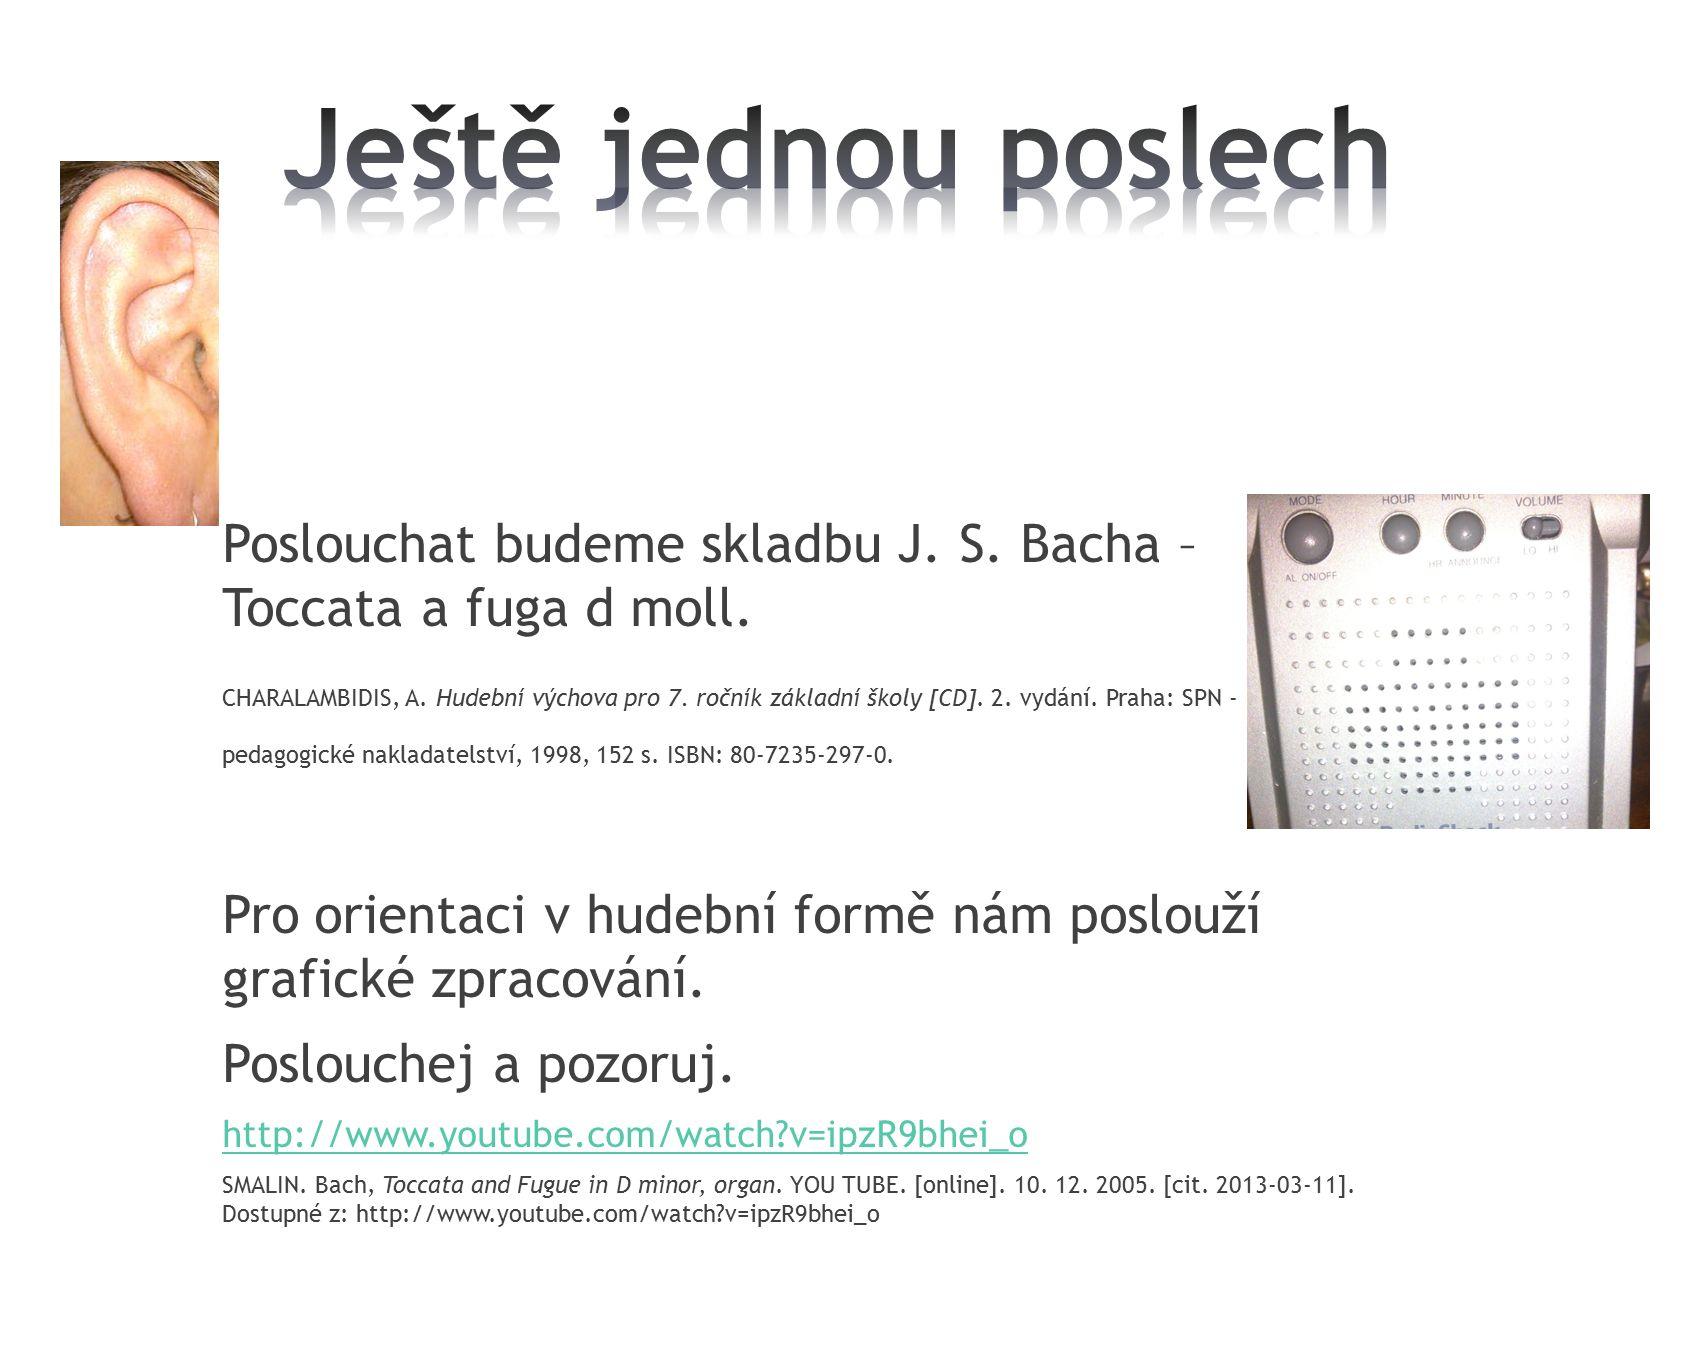 Poslouchat budeme skladbu J.S. Bacha – Toccata a fuga d moll.